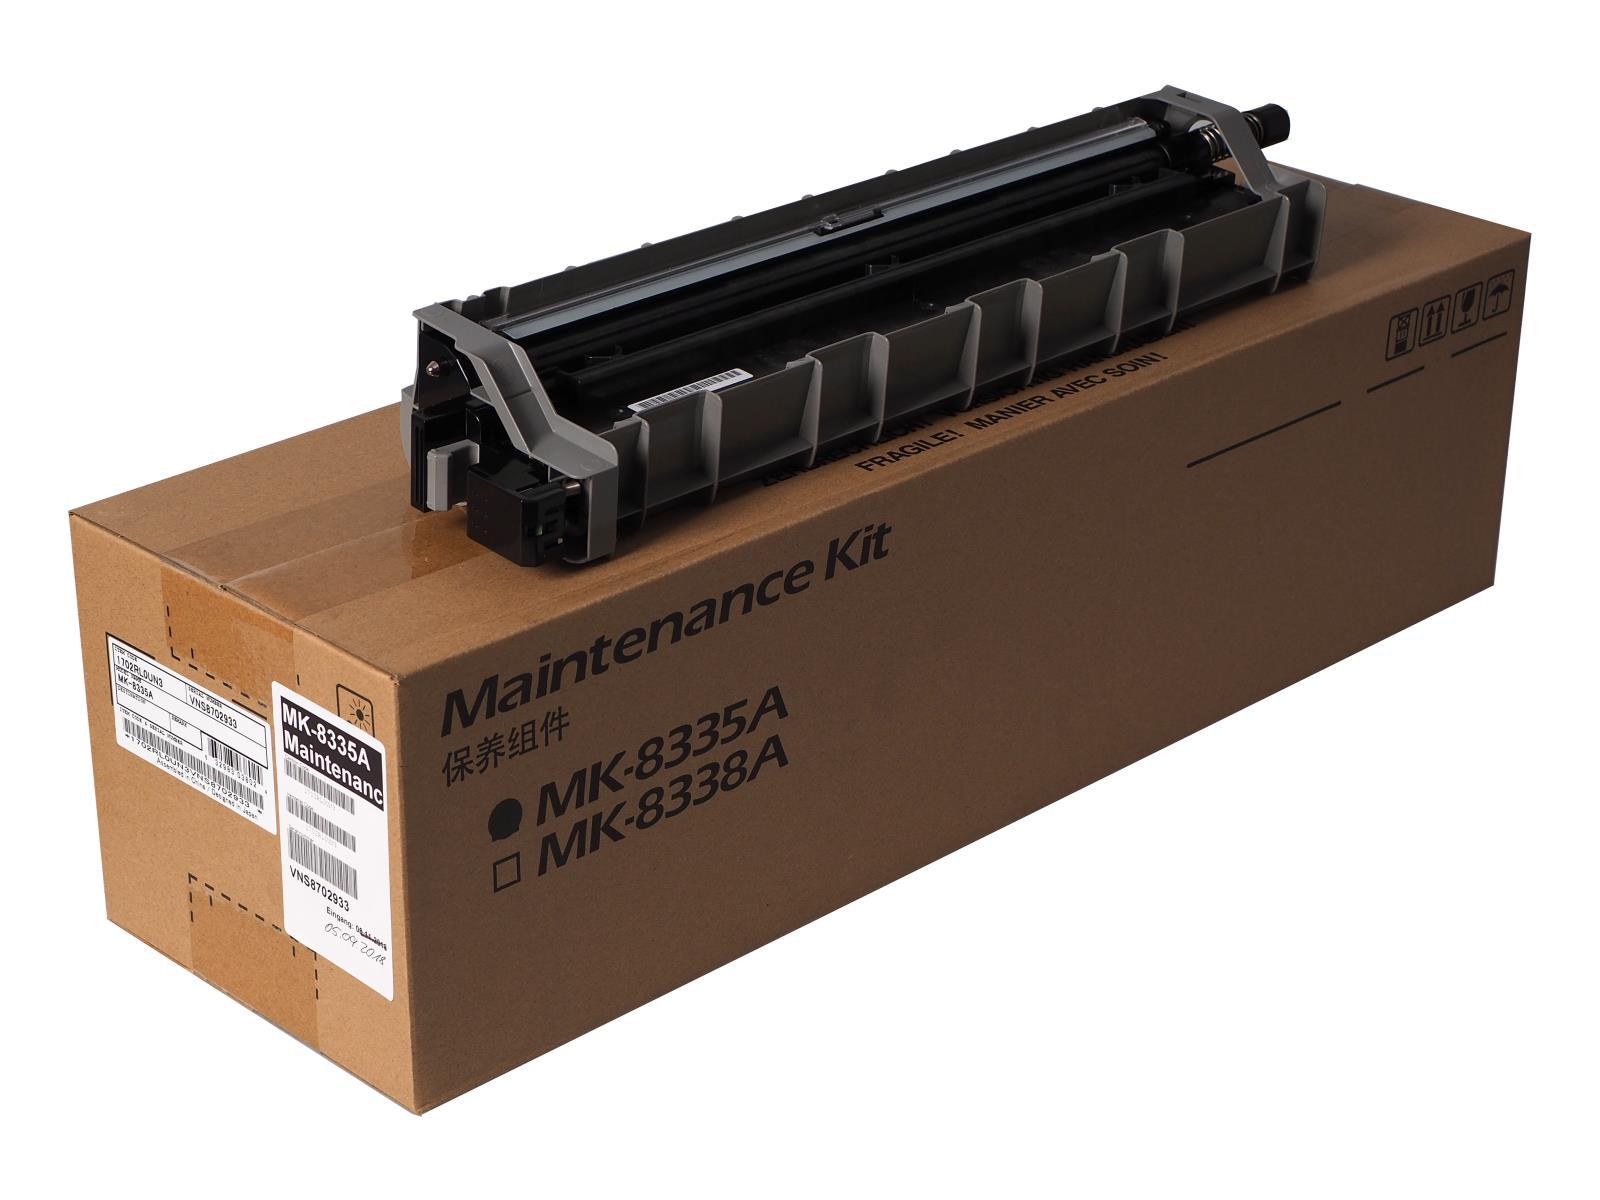 Genuine Maintenance Kit Typ: MK-8335A for Kyocera TASKalfa: 2552ci / 3252ci